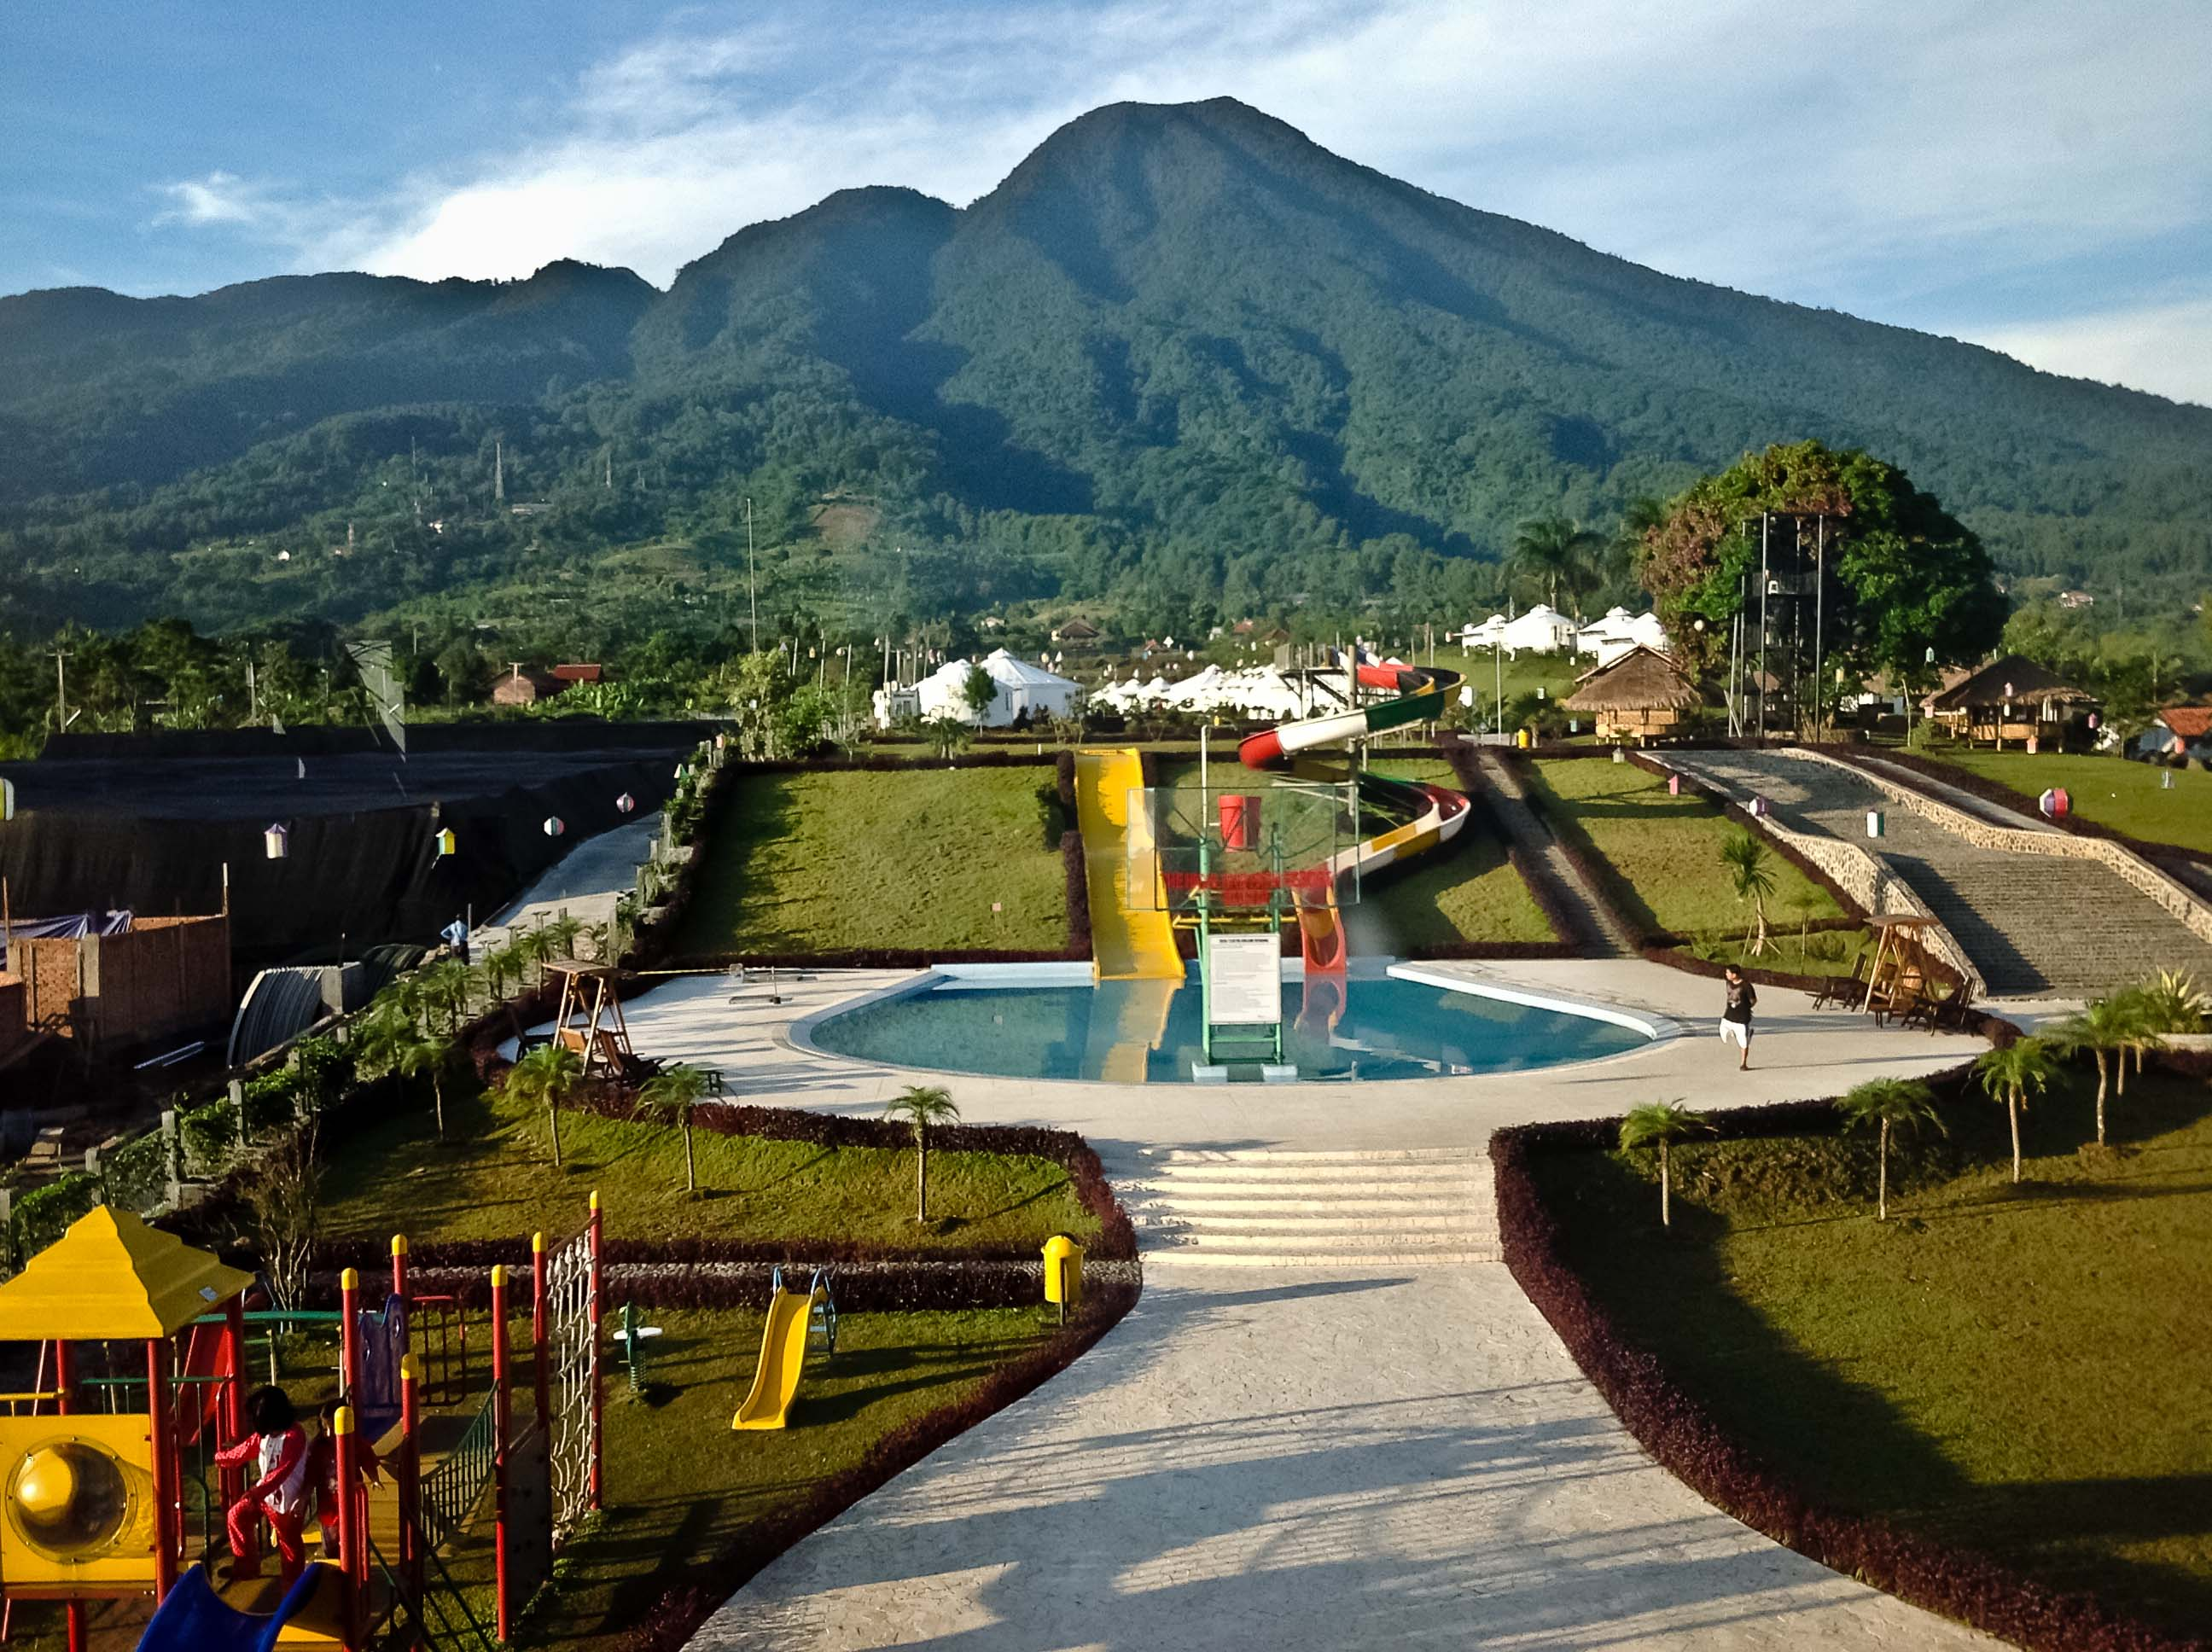 Menginap Di Tenda Mongolia Highland Park Resort Bogor Untold